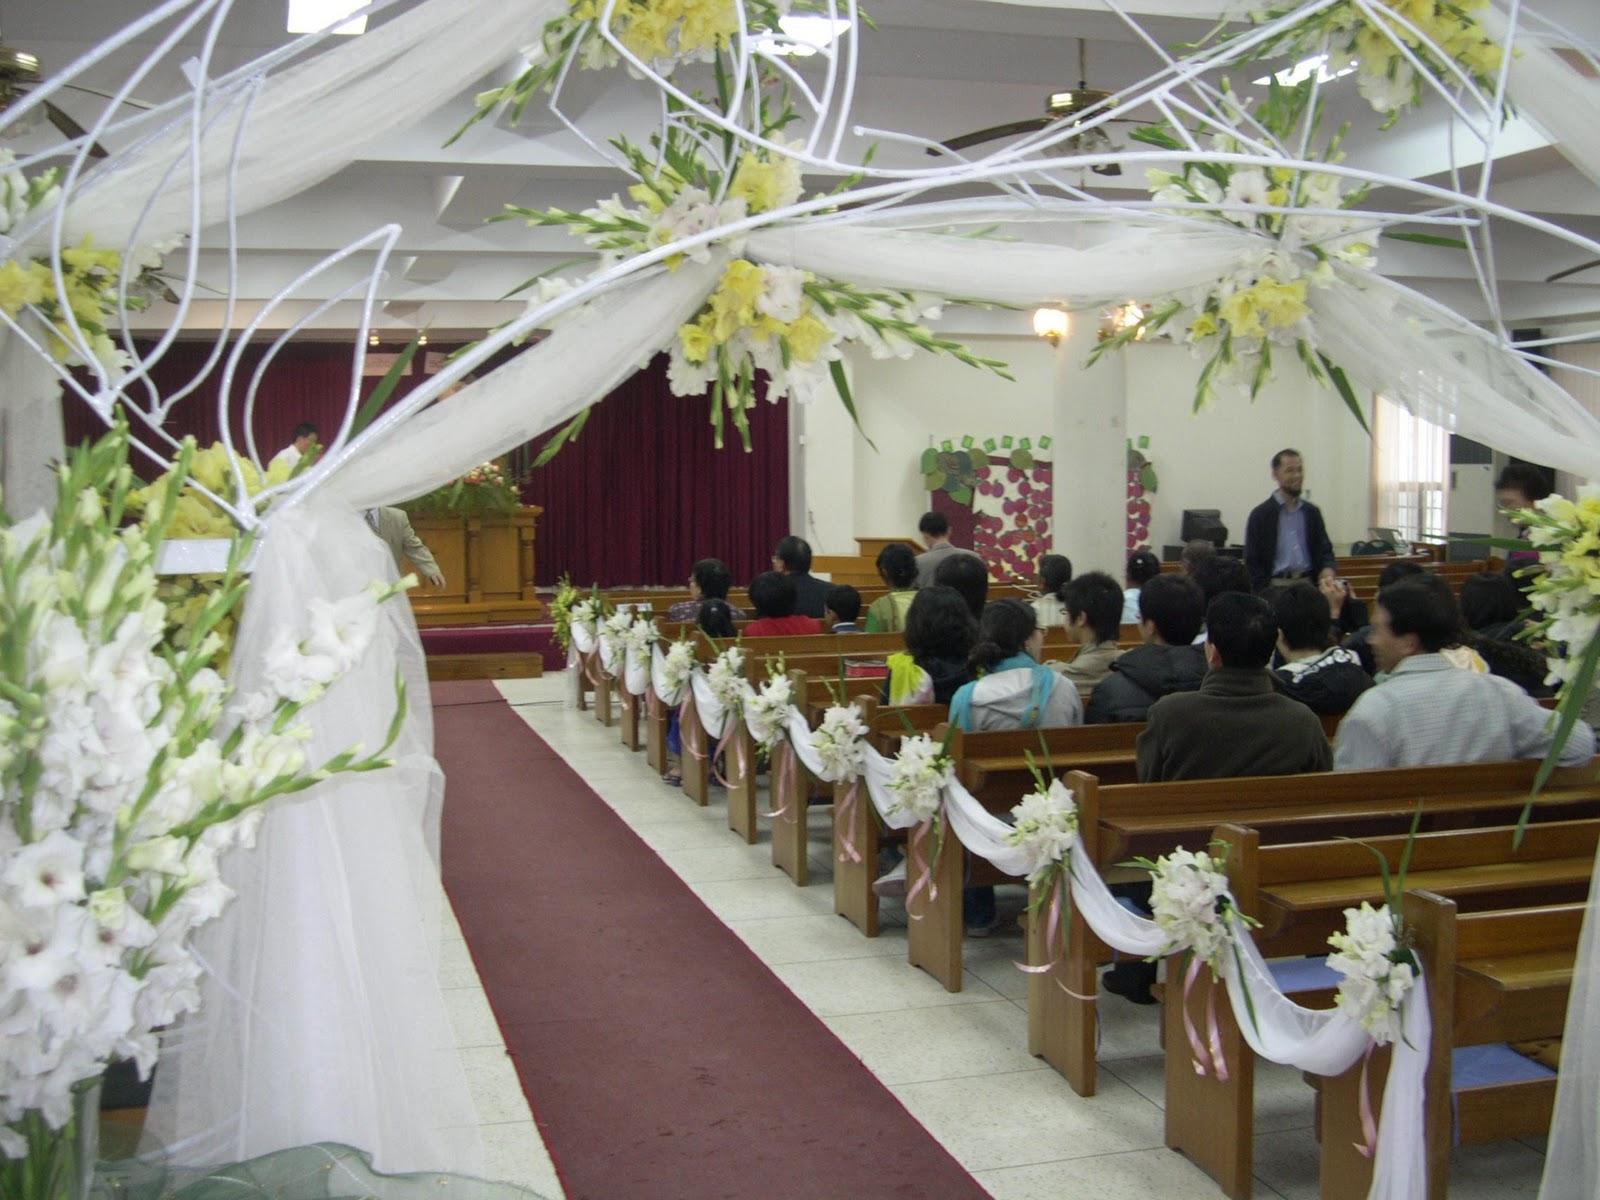 Sample Wedding Decoration Church: Church decorations wedding ...